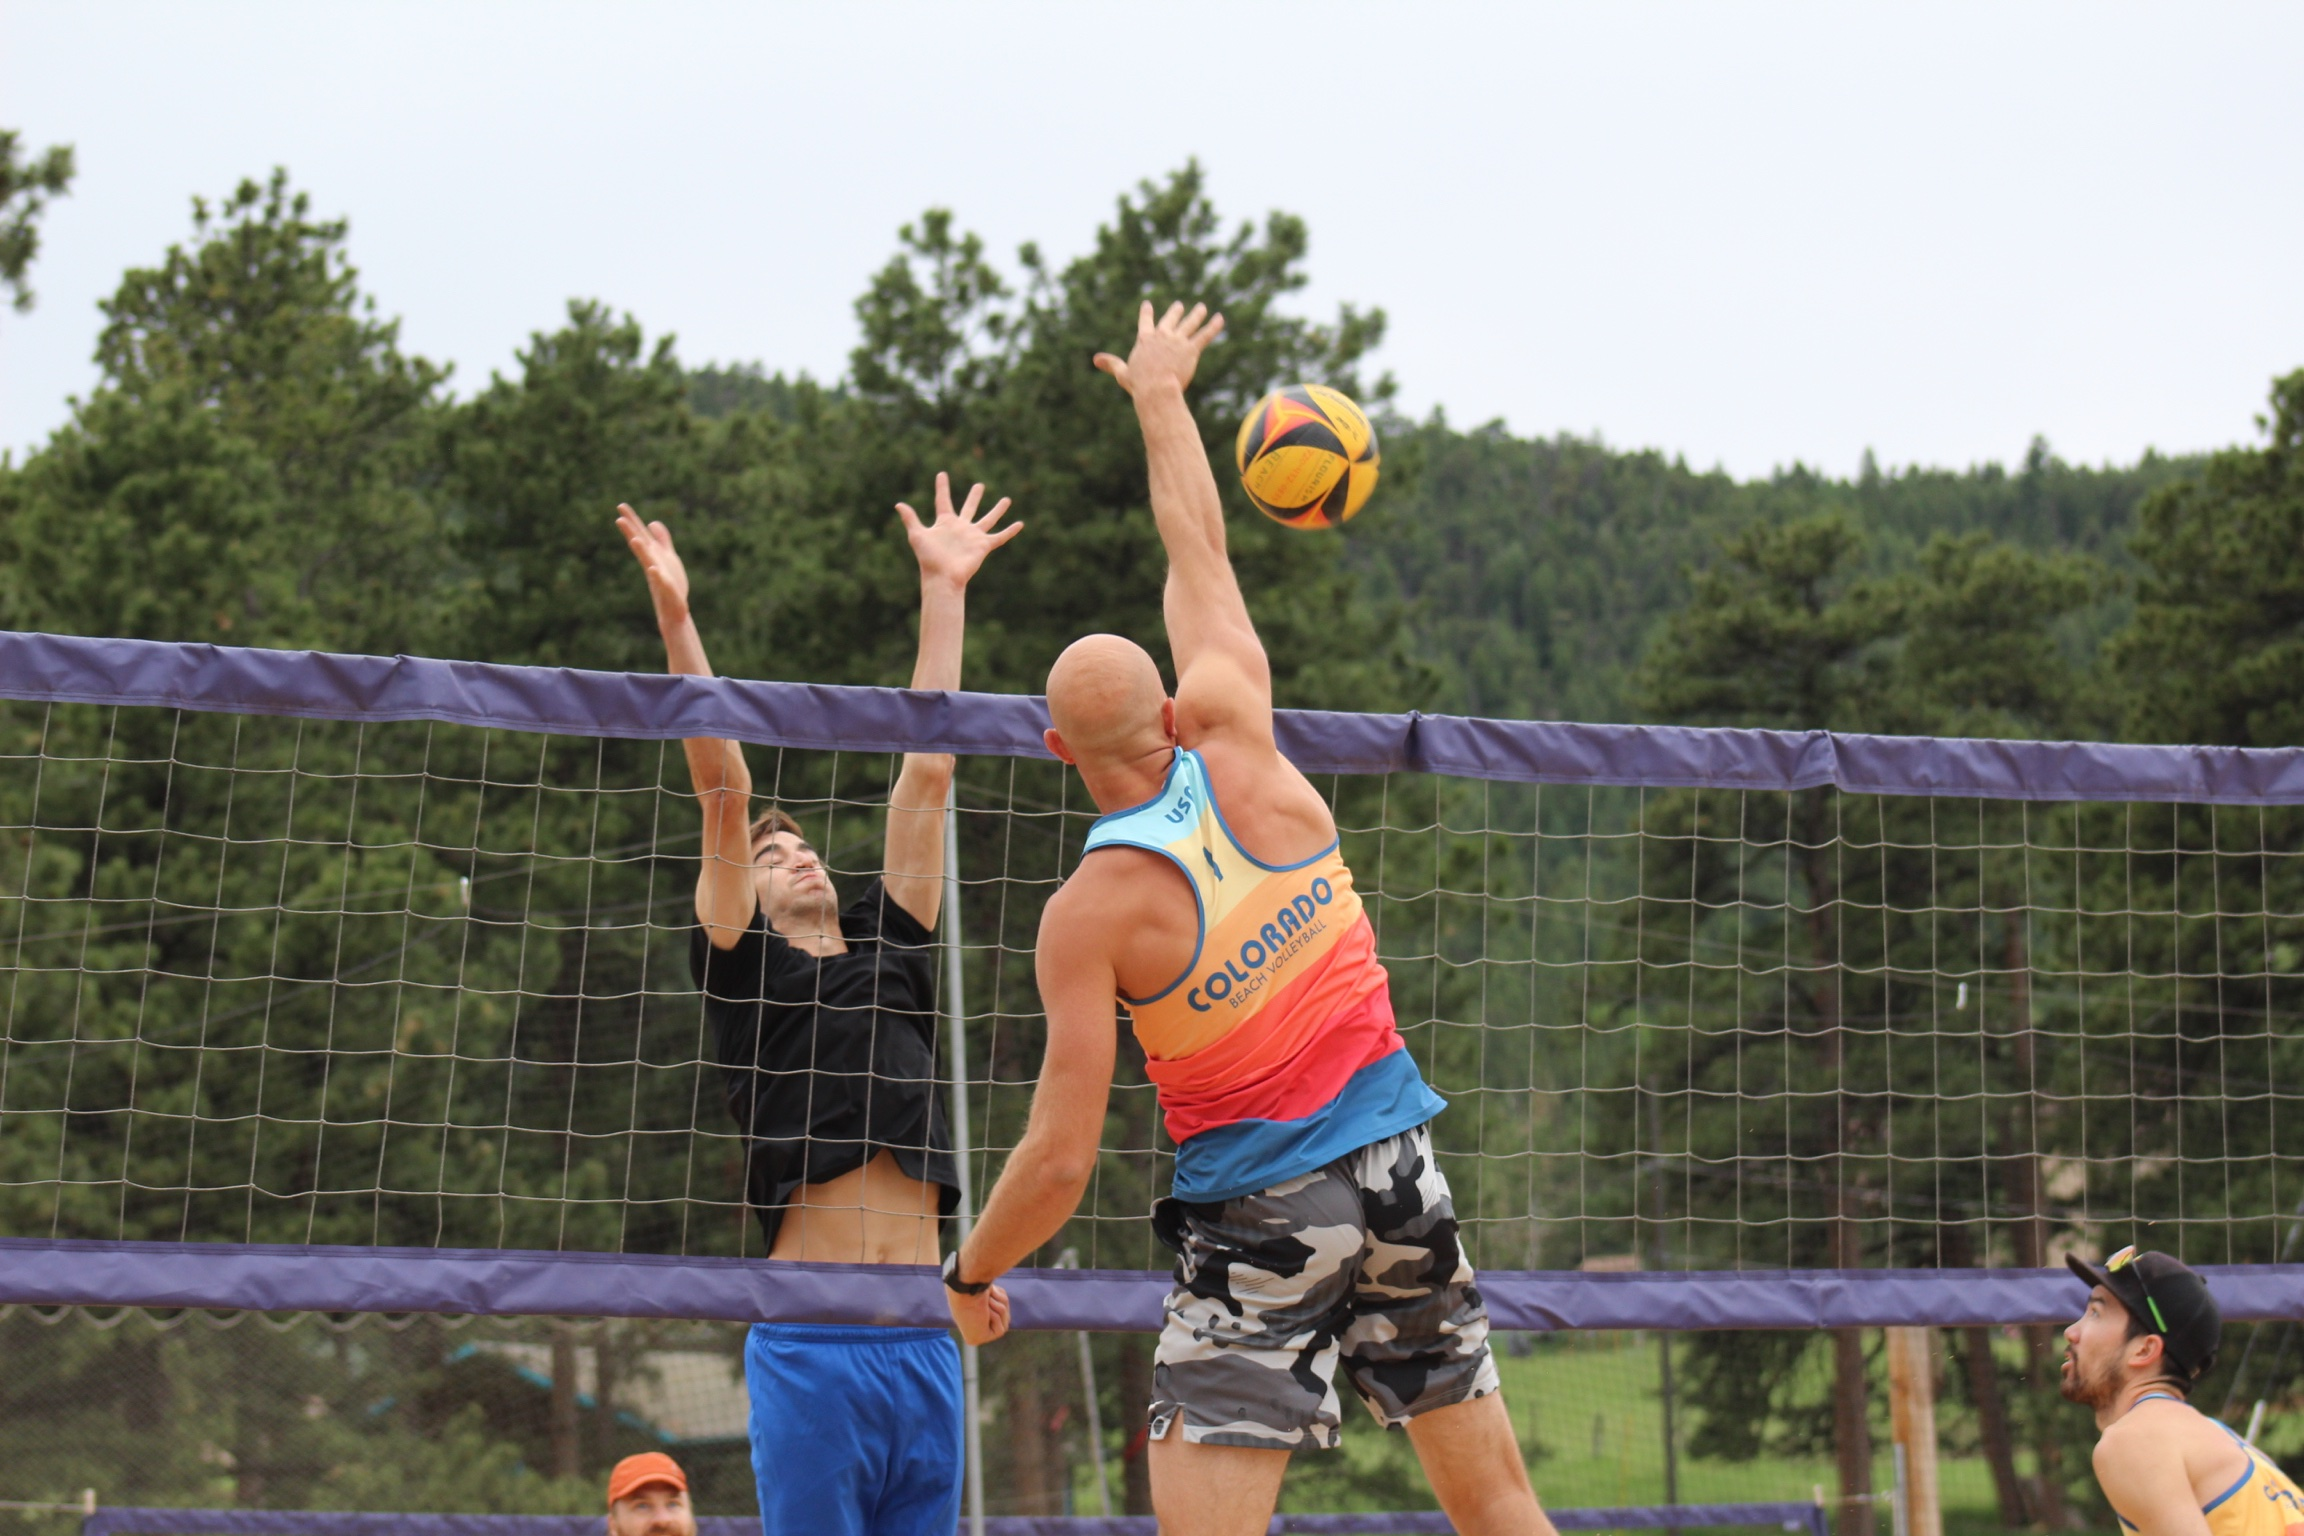 flourish volleyball sports t-shirt